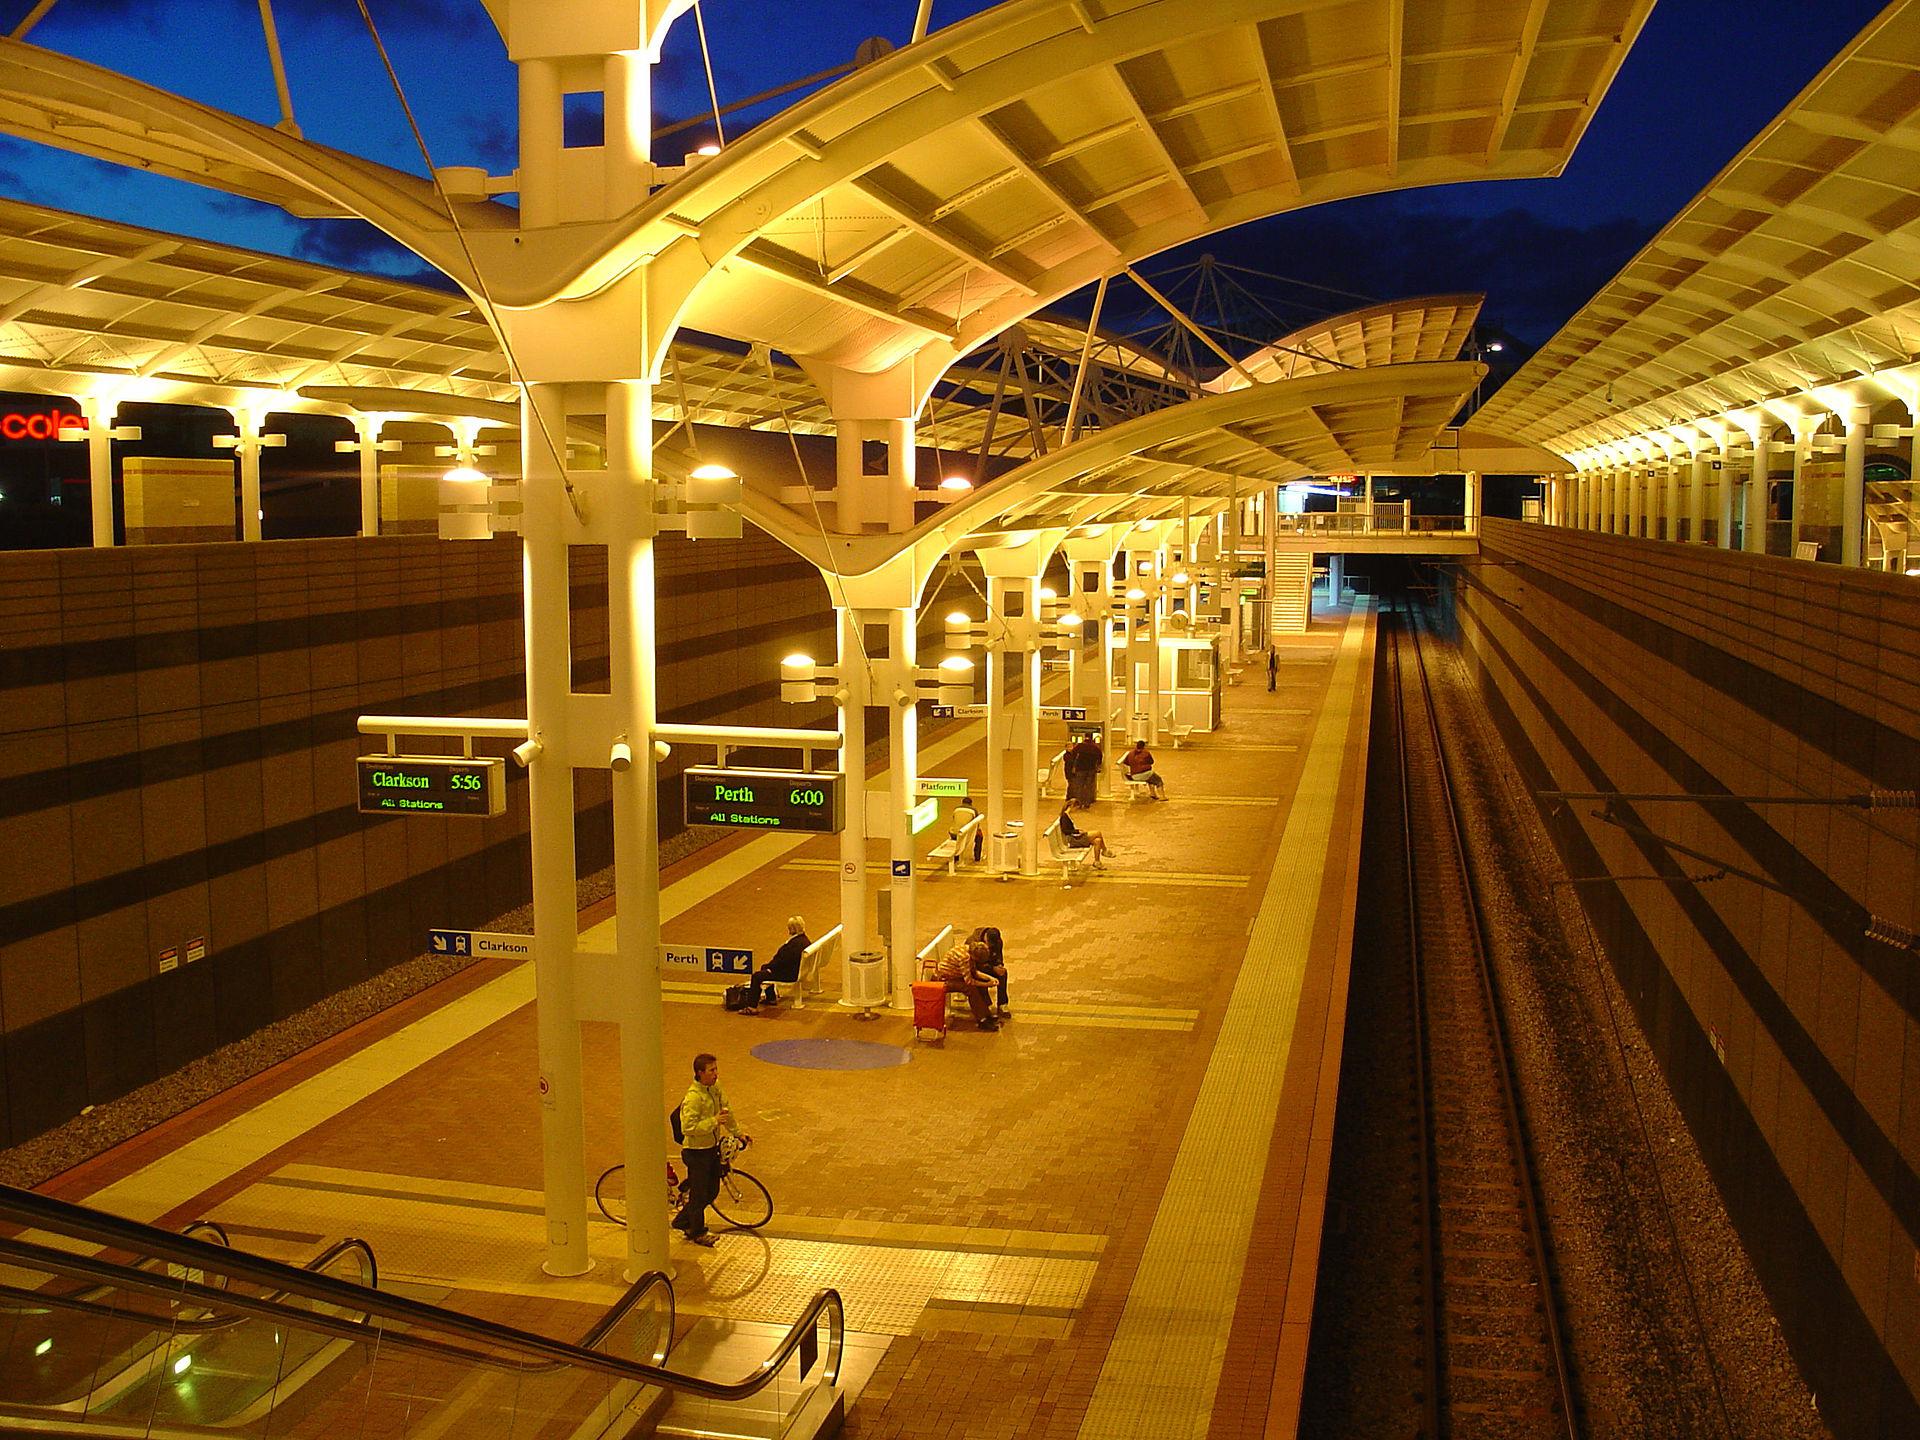 Joondalup Railway Station Wikipedia